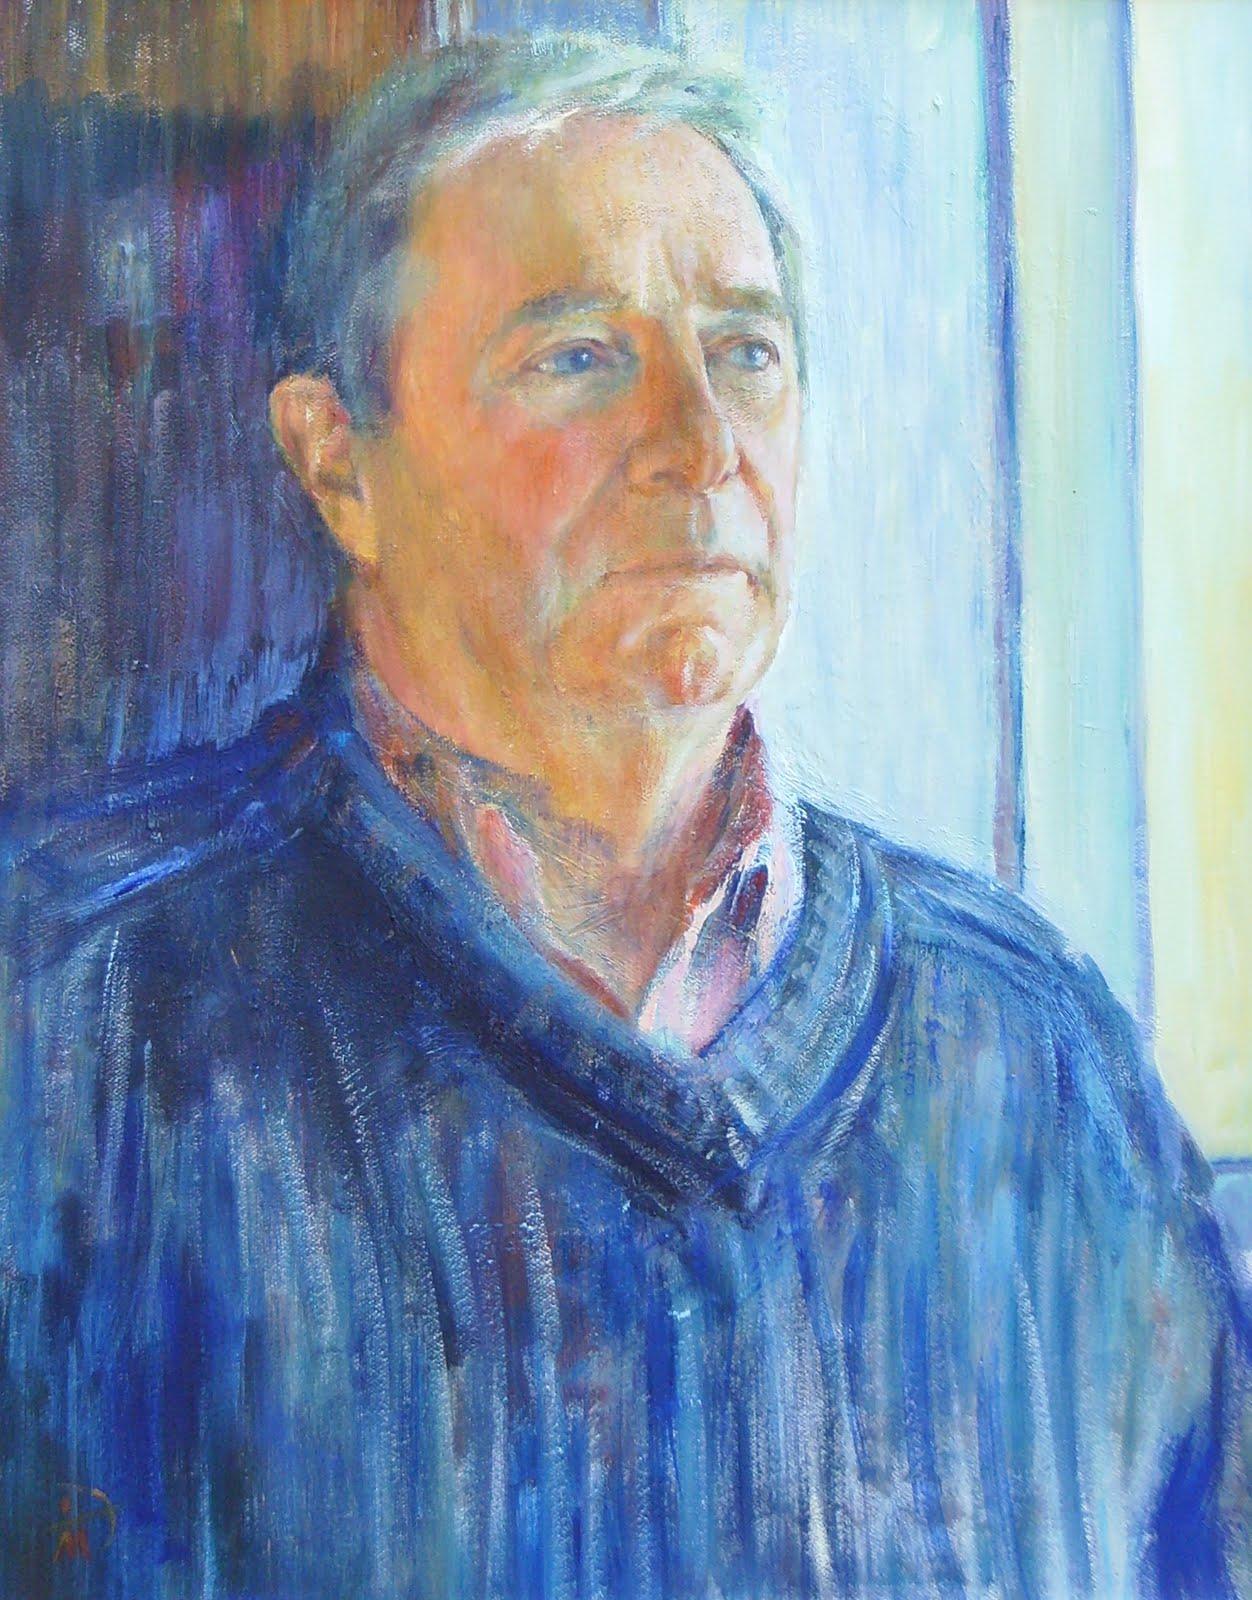 Portrait of John Gurney. Commission portrait by Marina Kim